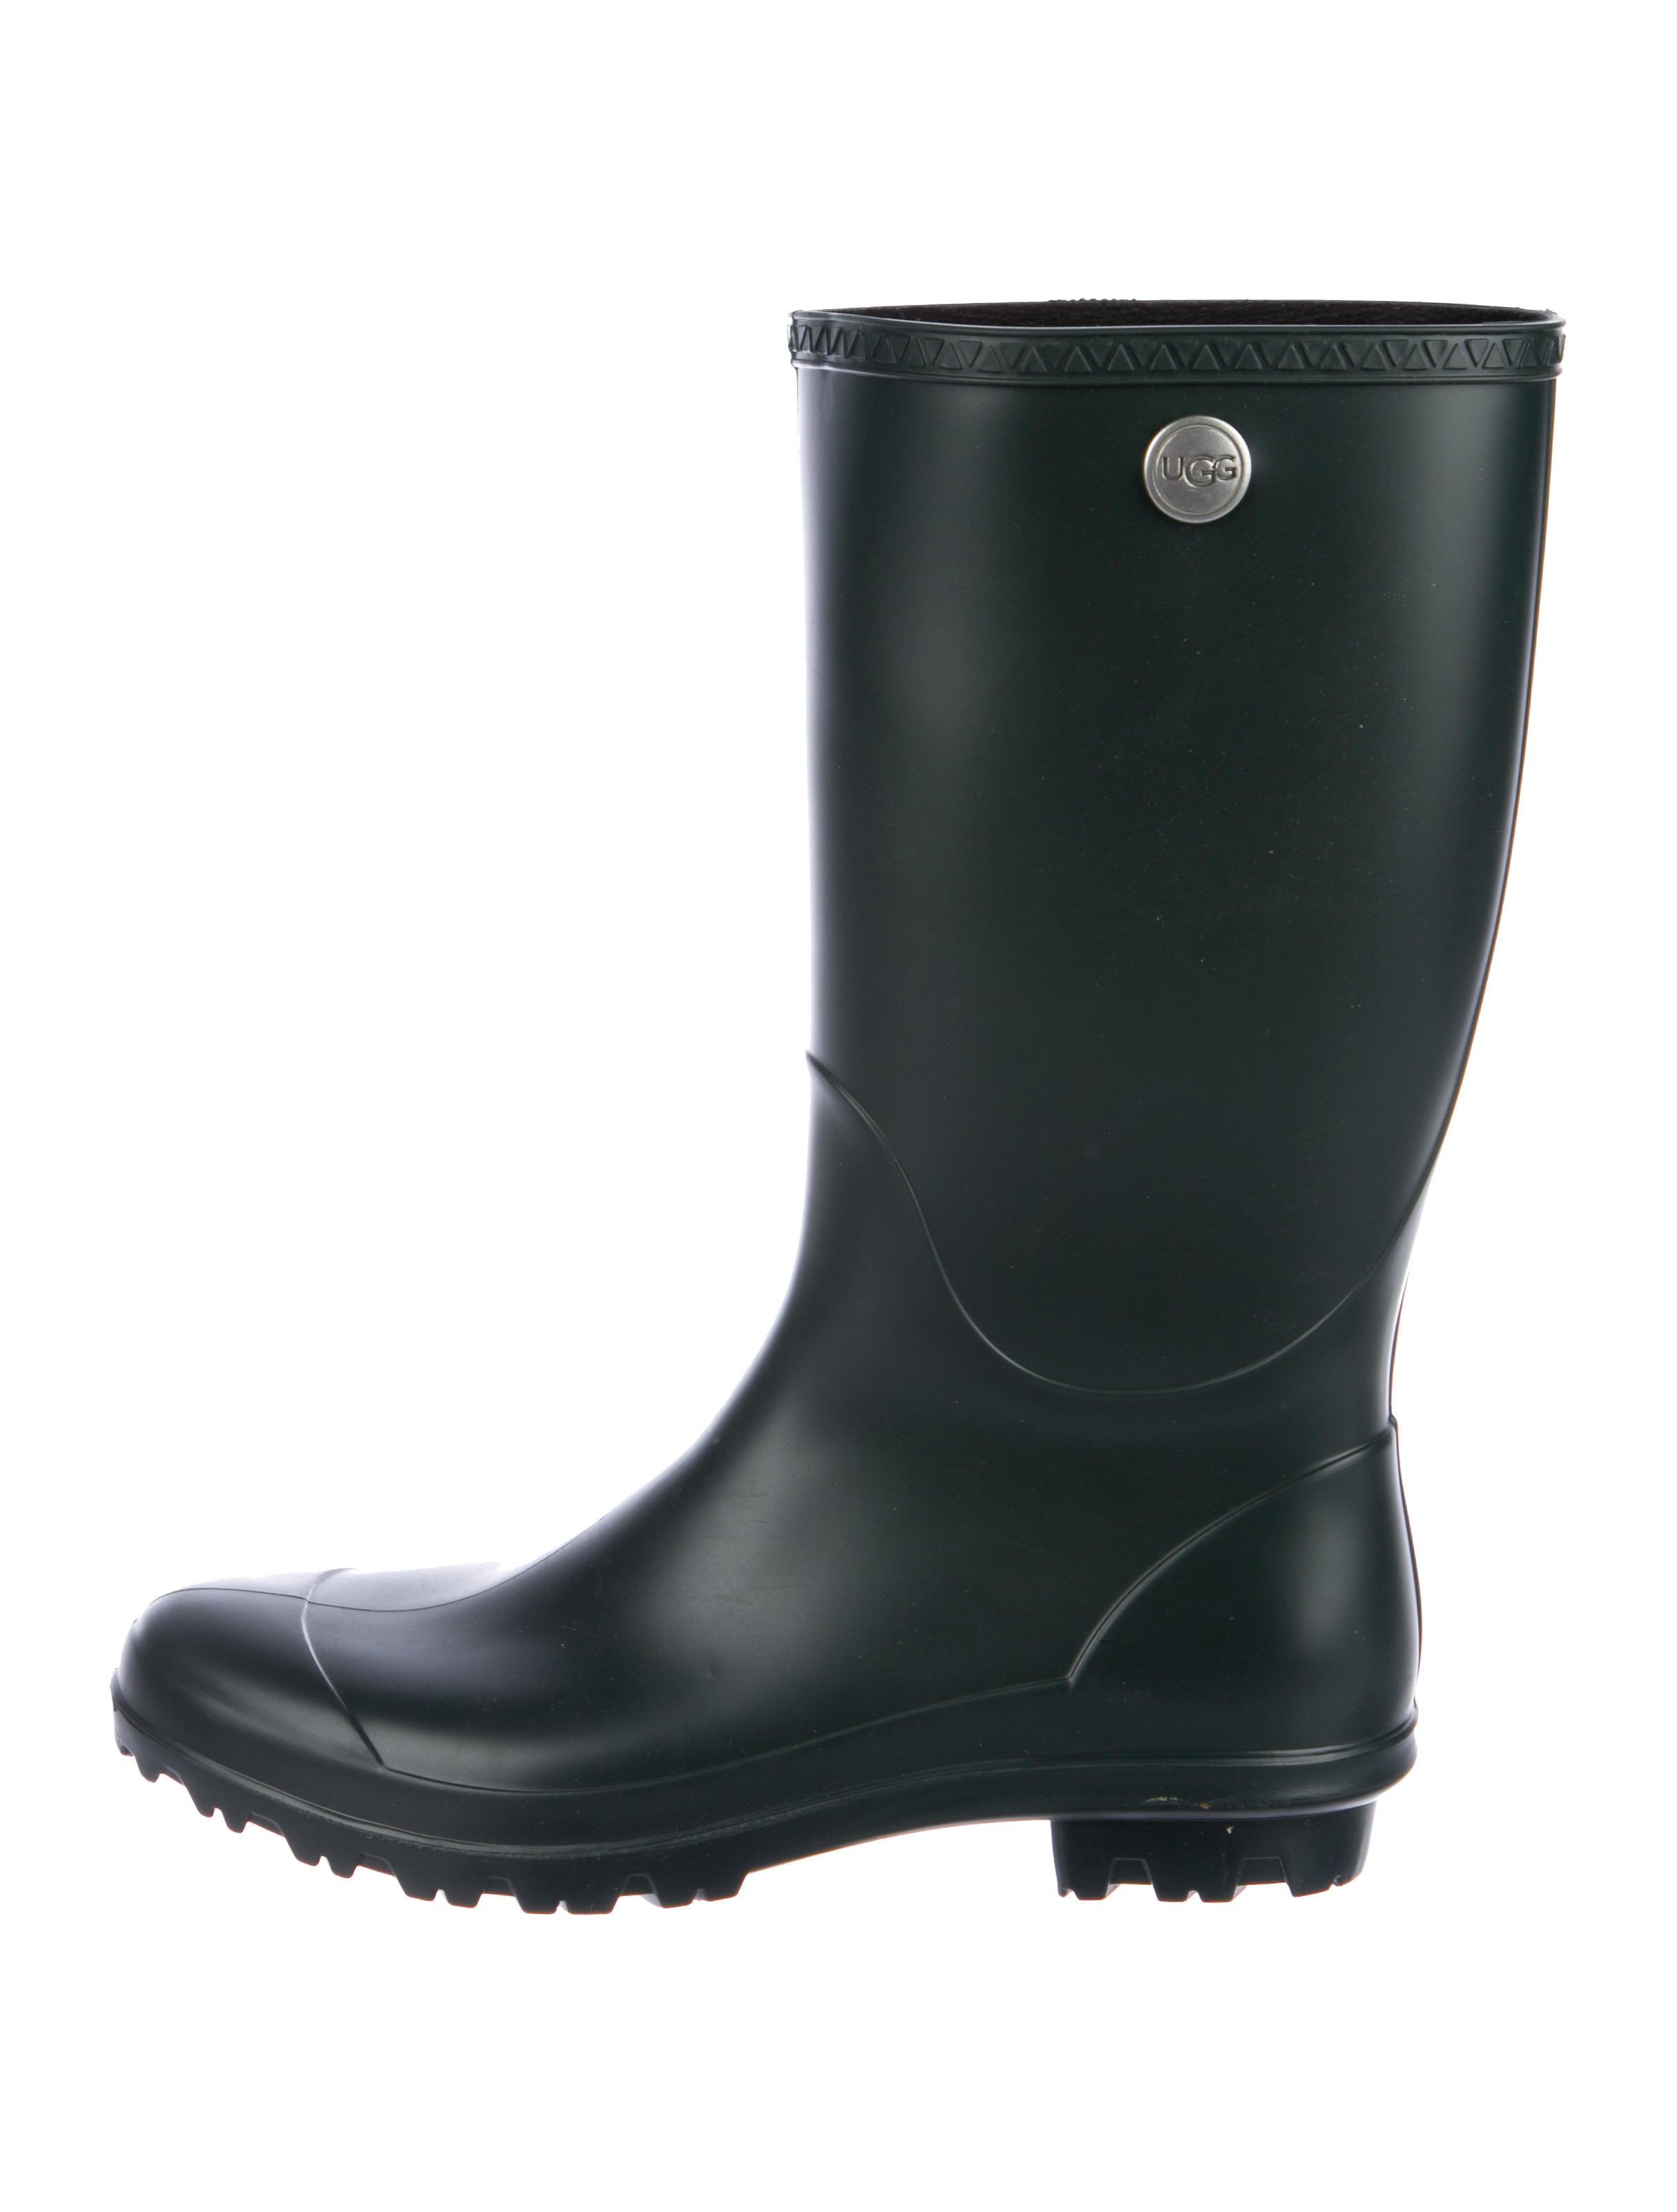 9e093119a3e13 UGG Australia Tall Rubber Rain Boots - Shoes - WUUGG29430